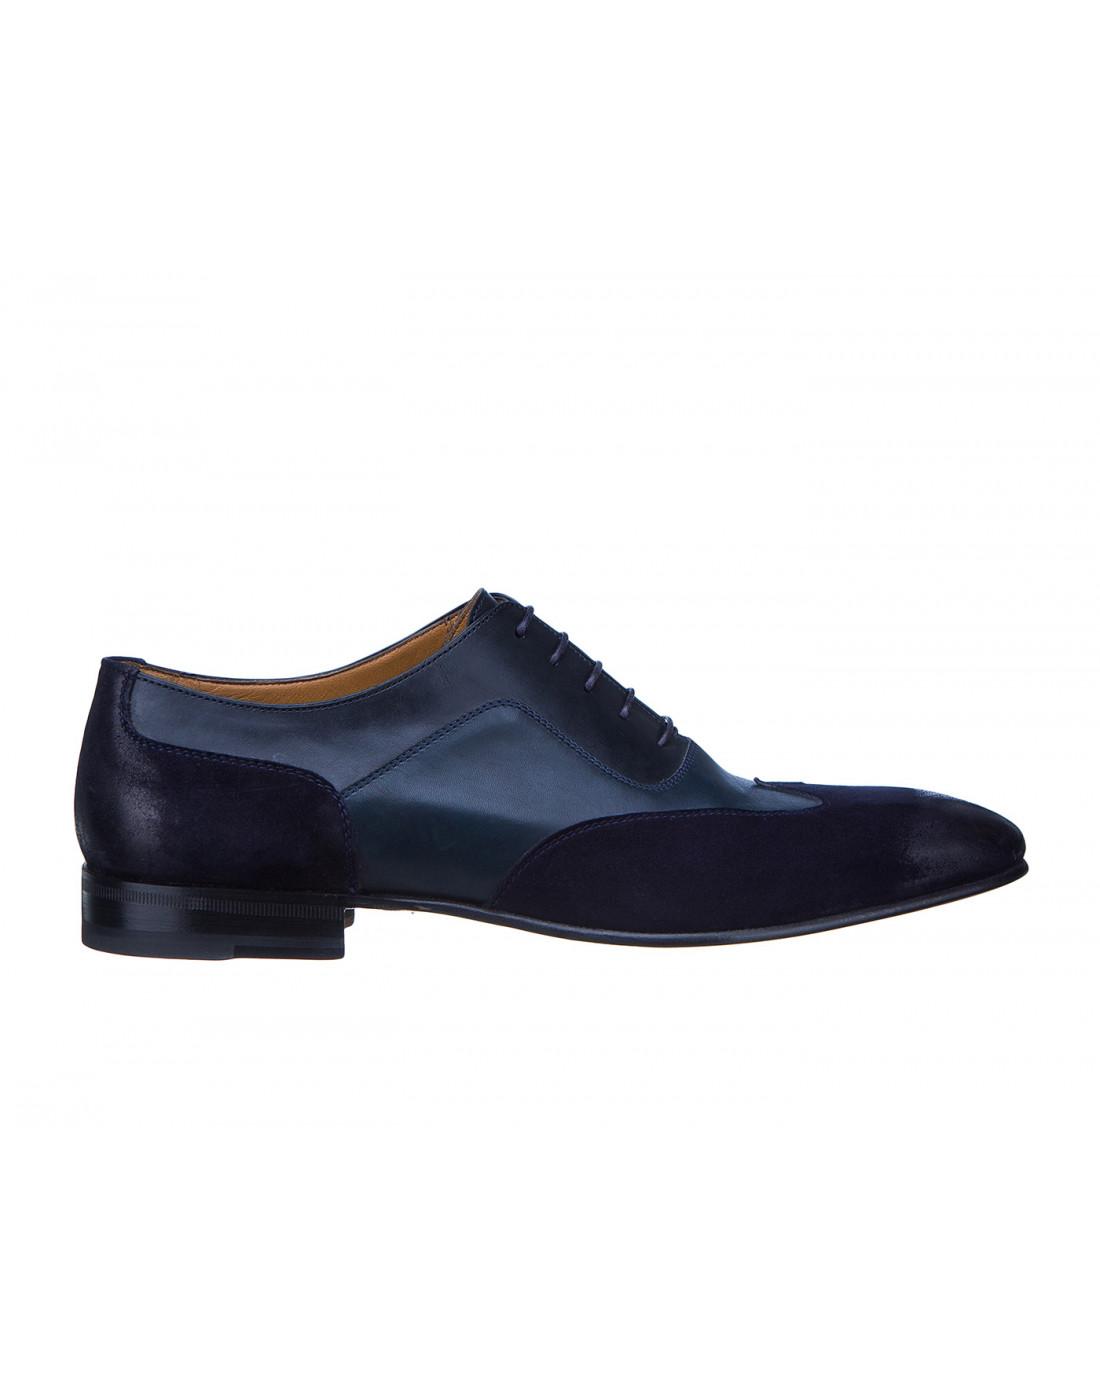 Туфли синие мужские Moreschi S42619 BLUE-1